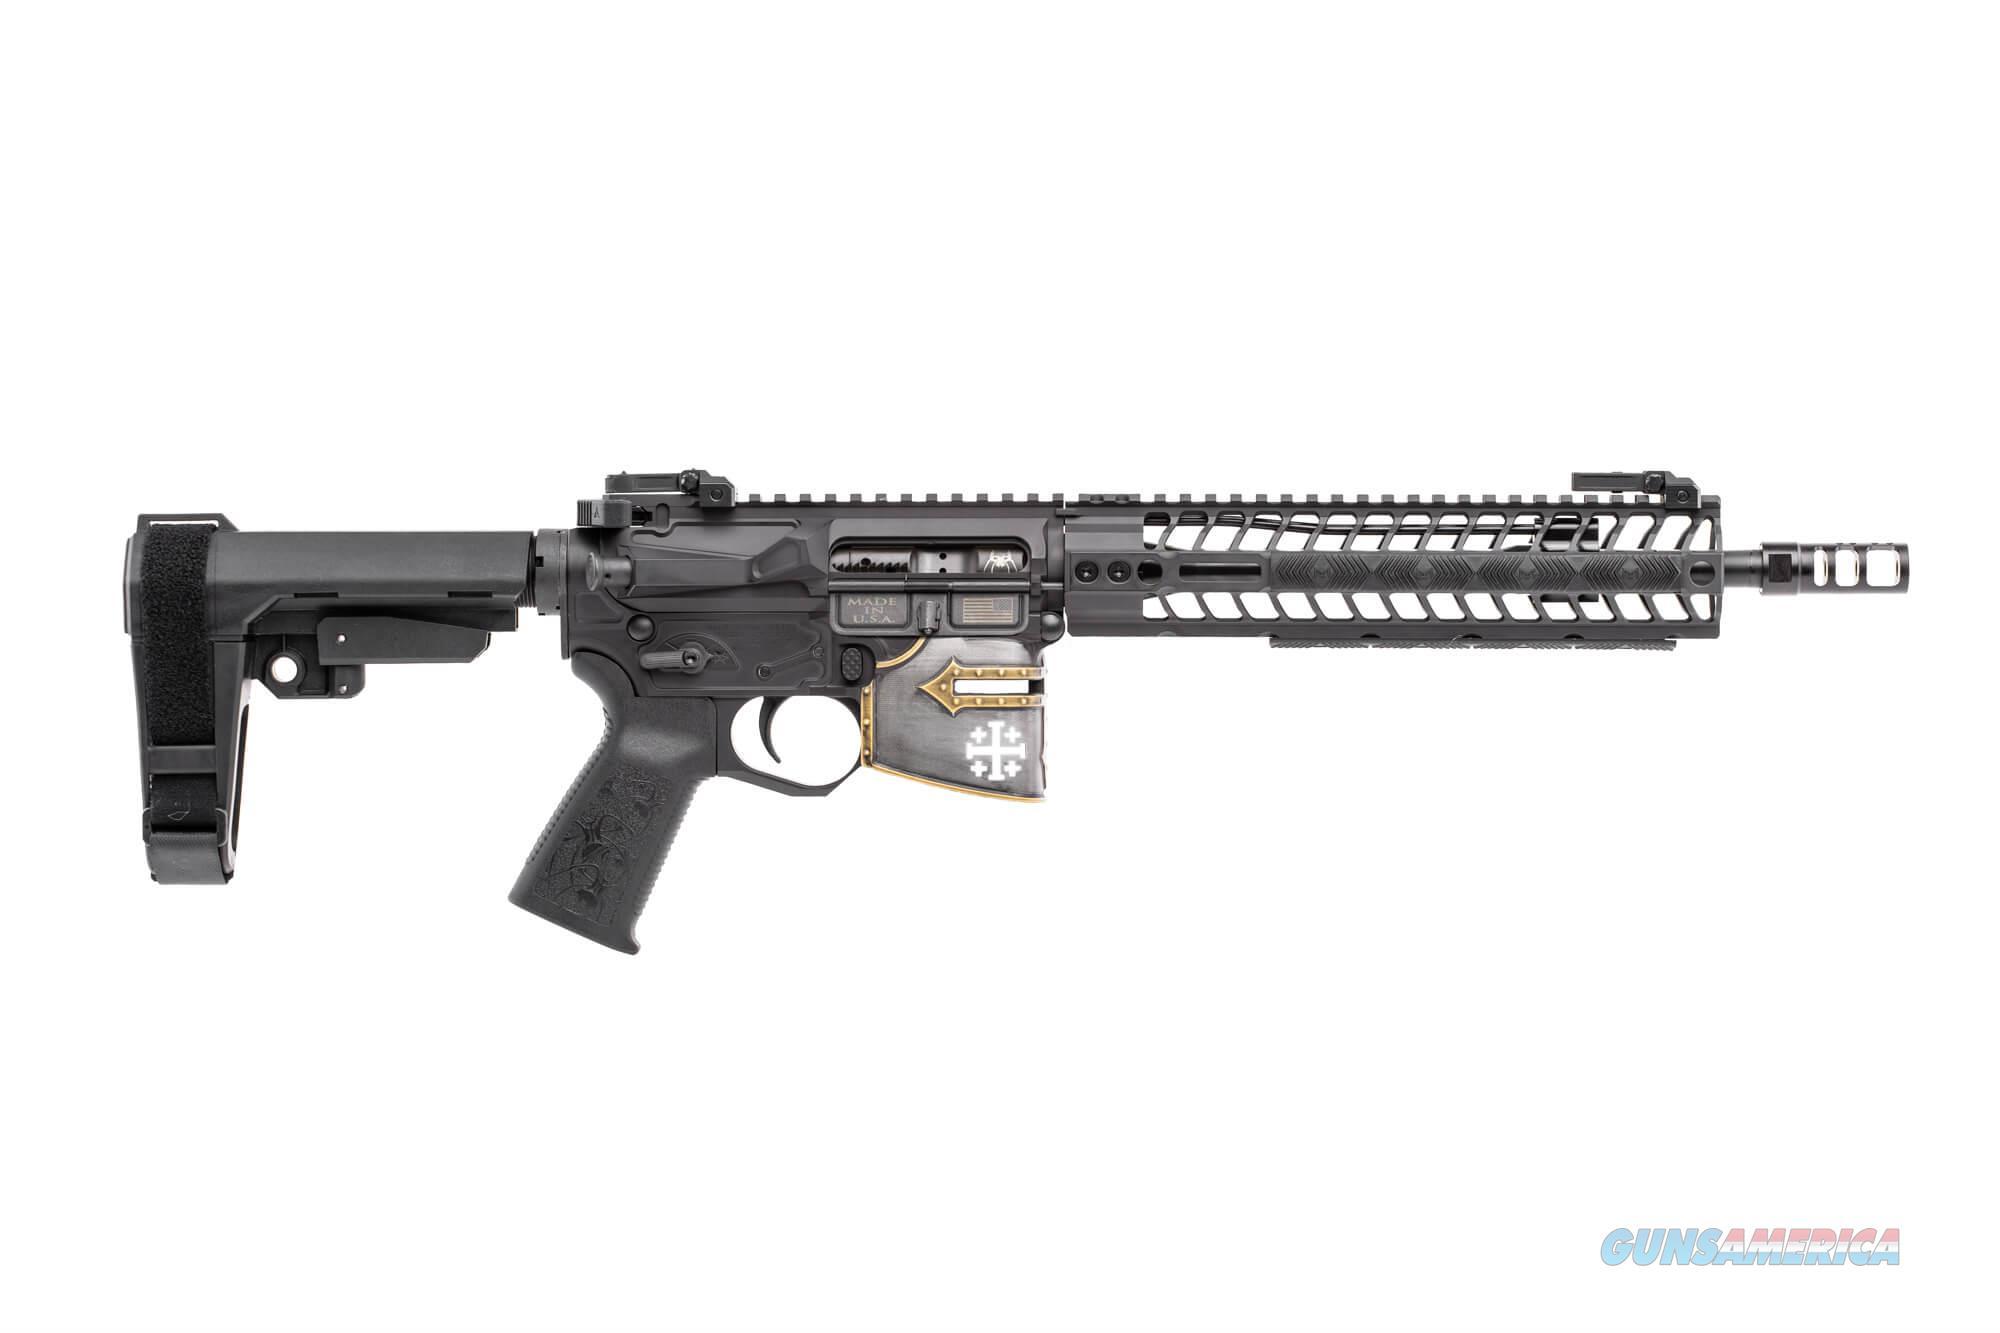 "Spikes Tactical Rare Breed Crusader Pistol 5.56 AR-15 11.5"" Non-NFA 30+1 NIB SALE PRICE STP5625-M1R  Guns > Pistols > Spikes Tactical Pistols"